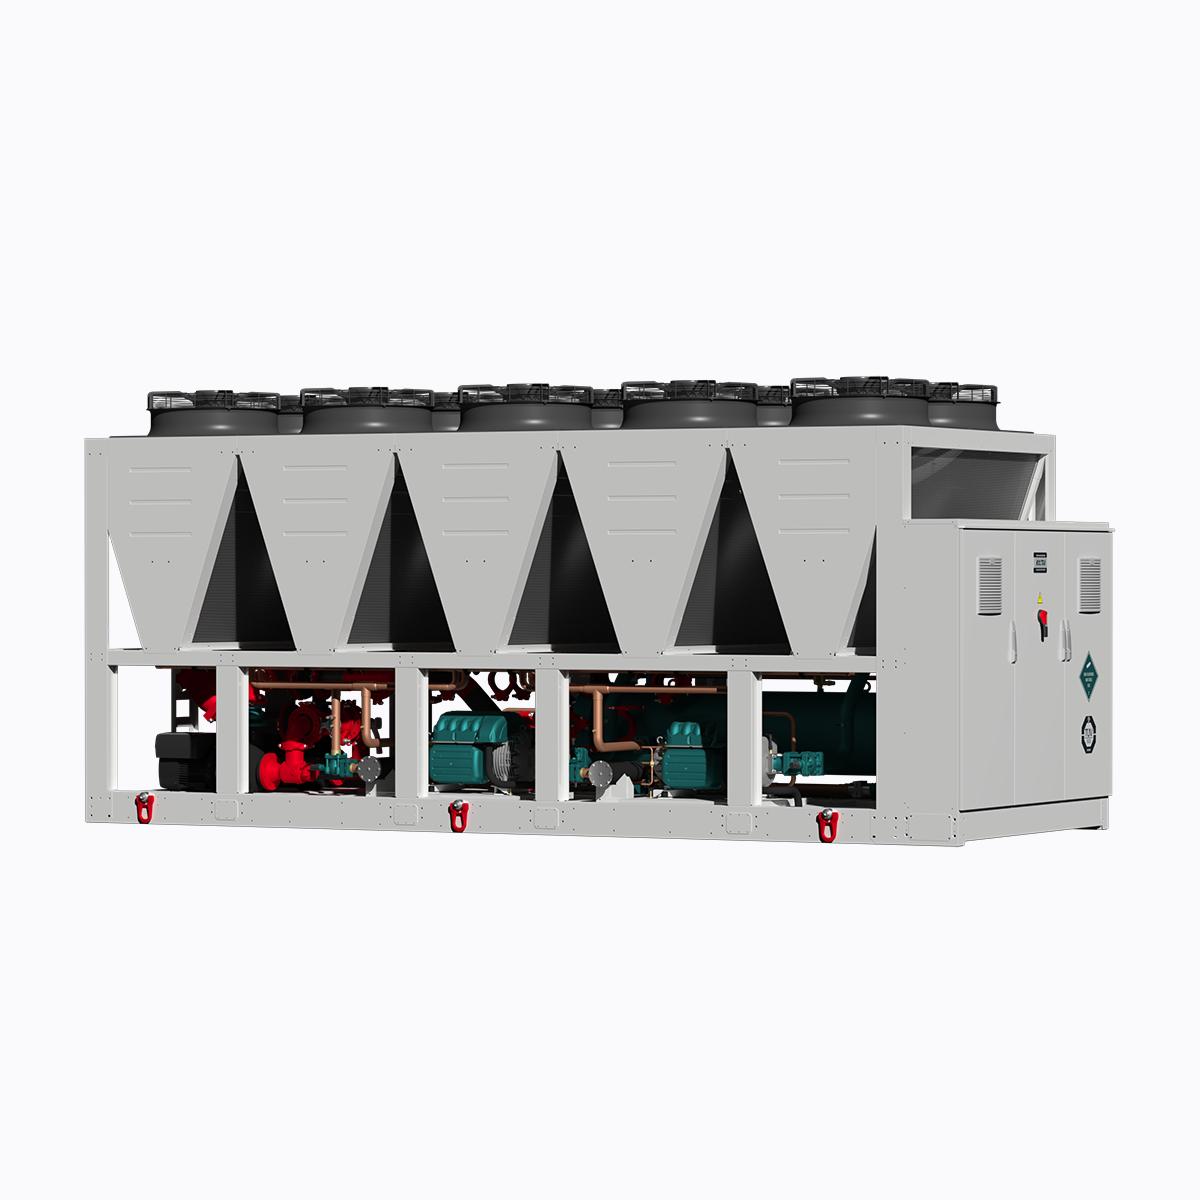 Kaltra to modernize its air-cooled Turbocor chiller range